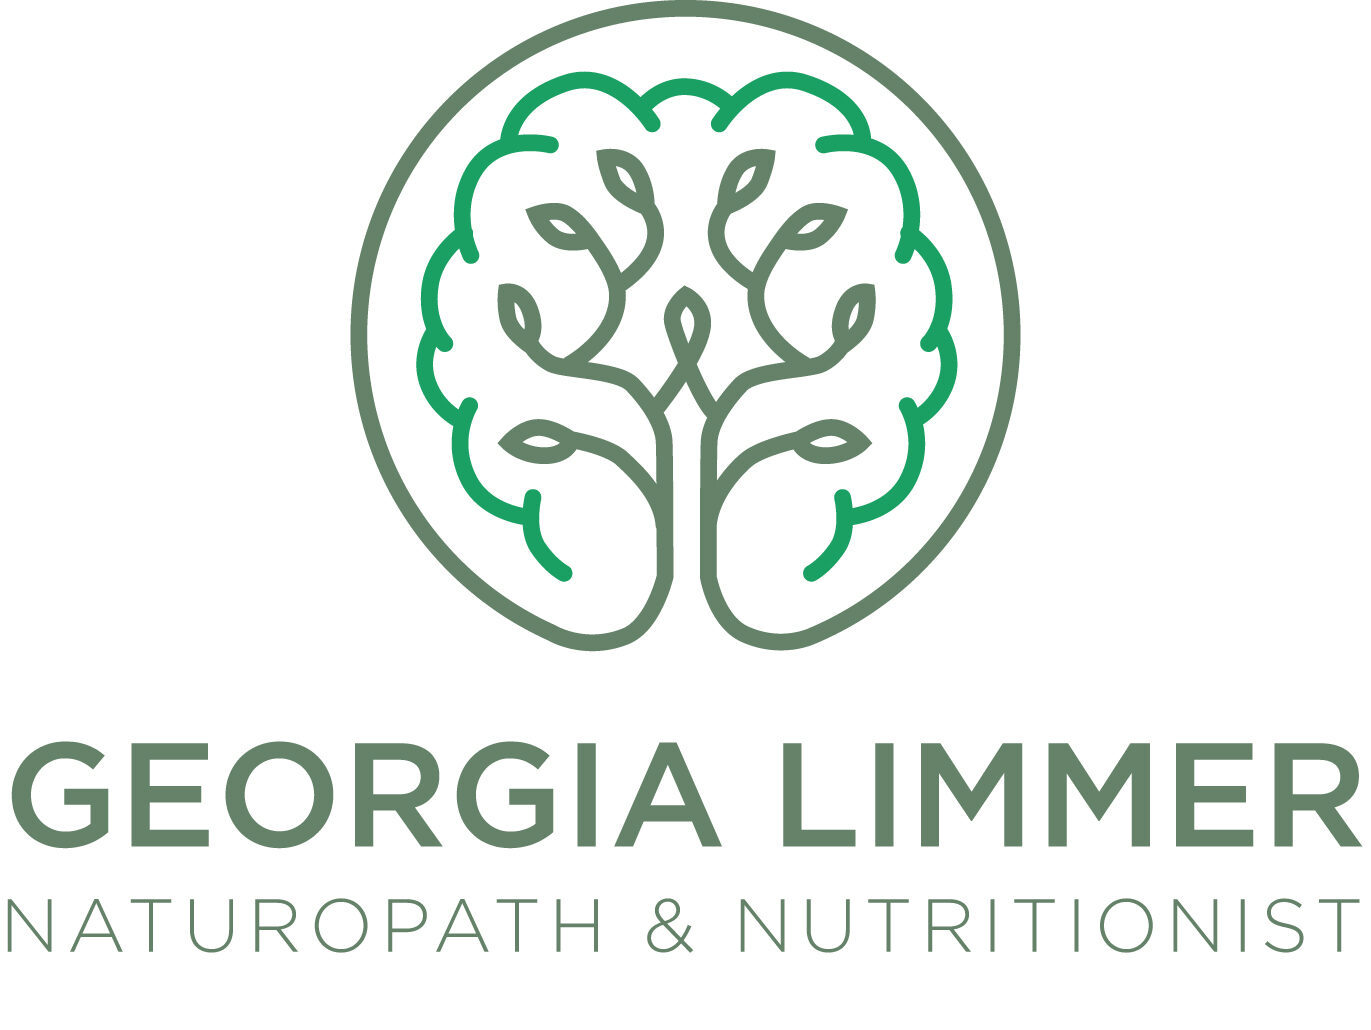 Georgia Limmer